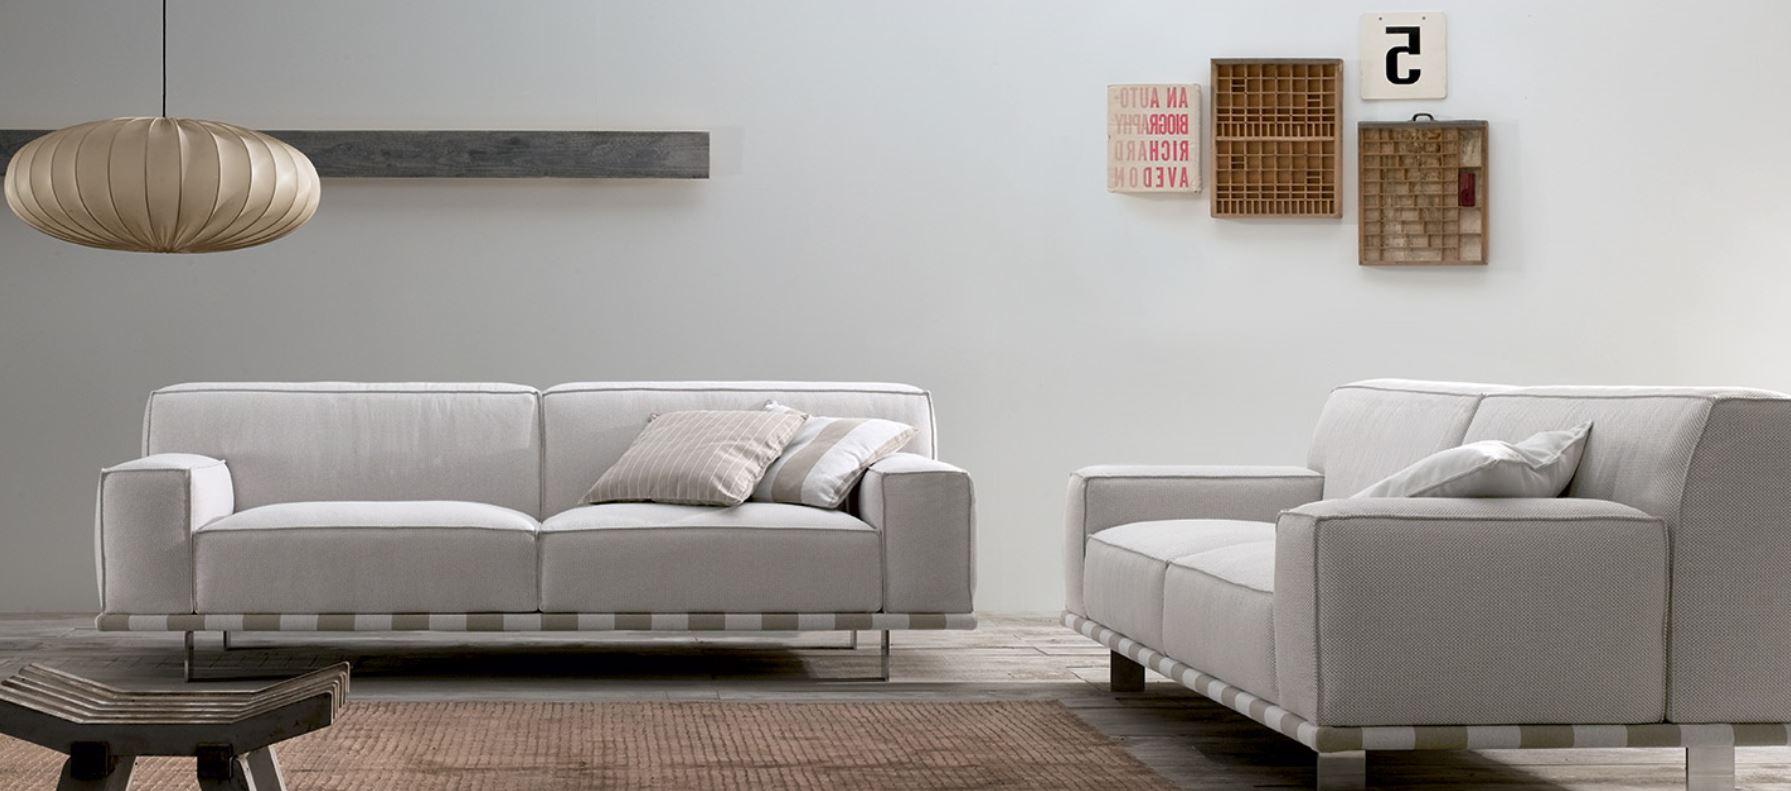 Beautiful Negozi Divani Torino Contemporary - acrylicgiftware.us ...